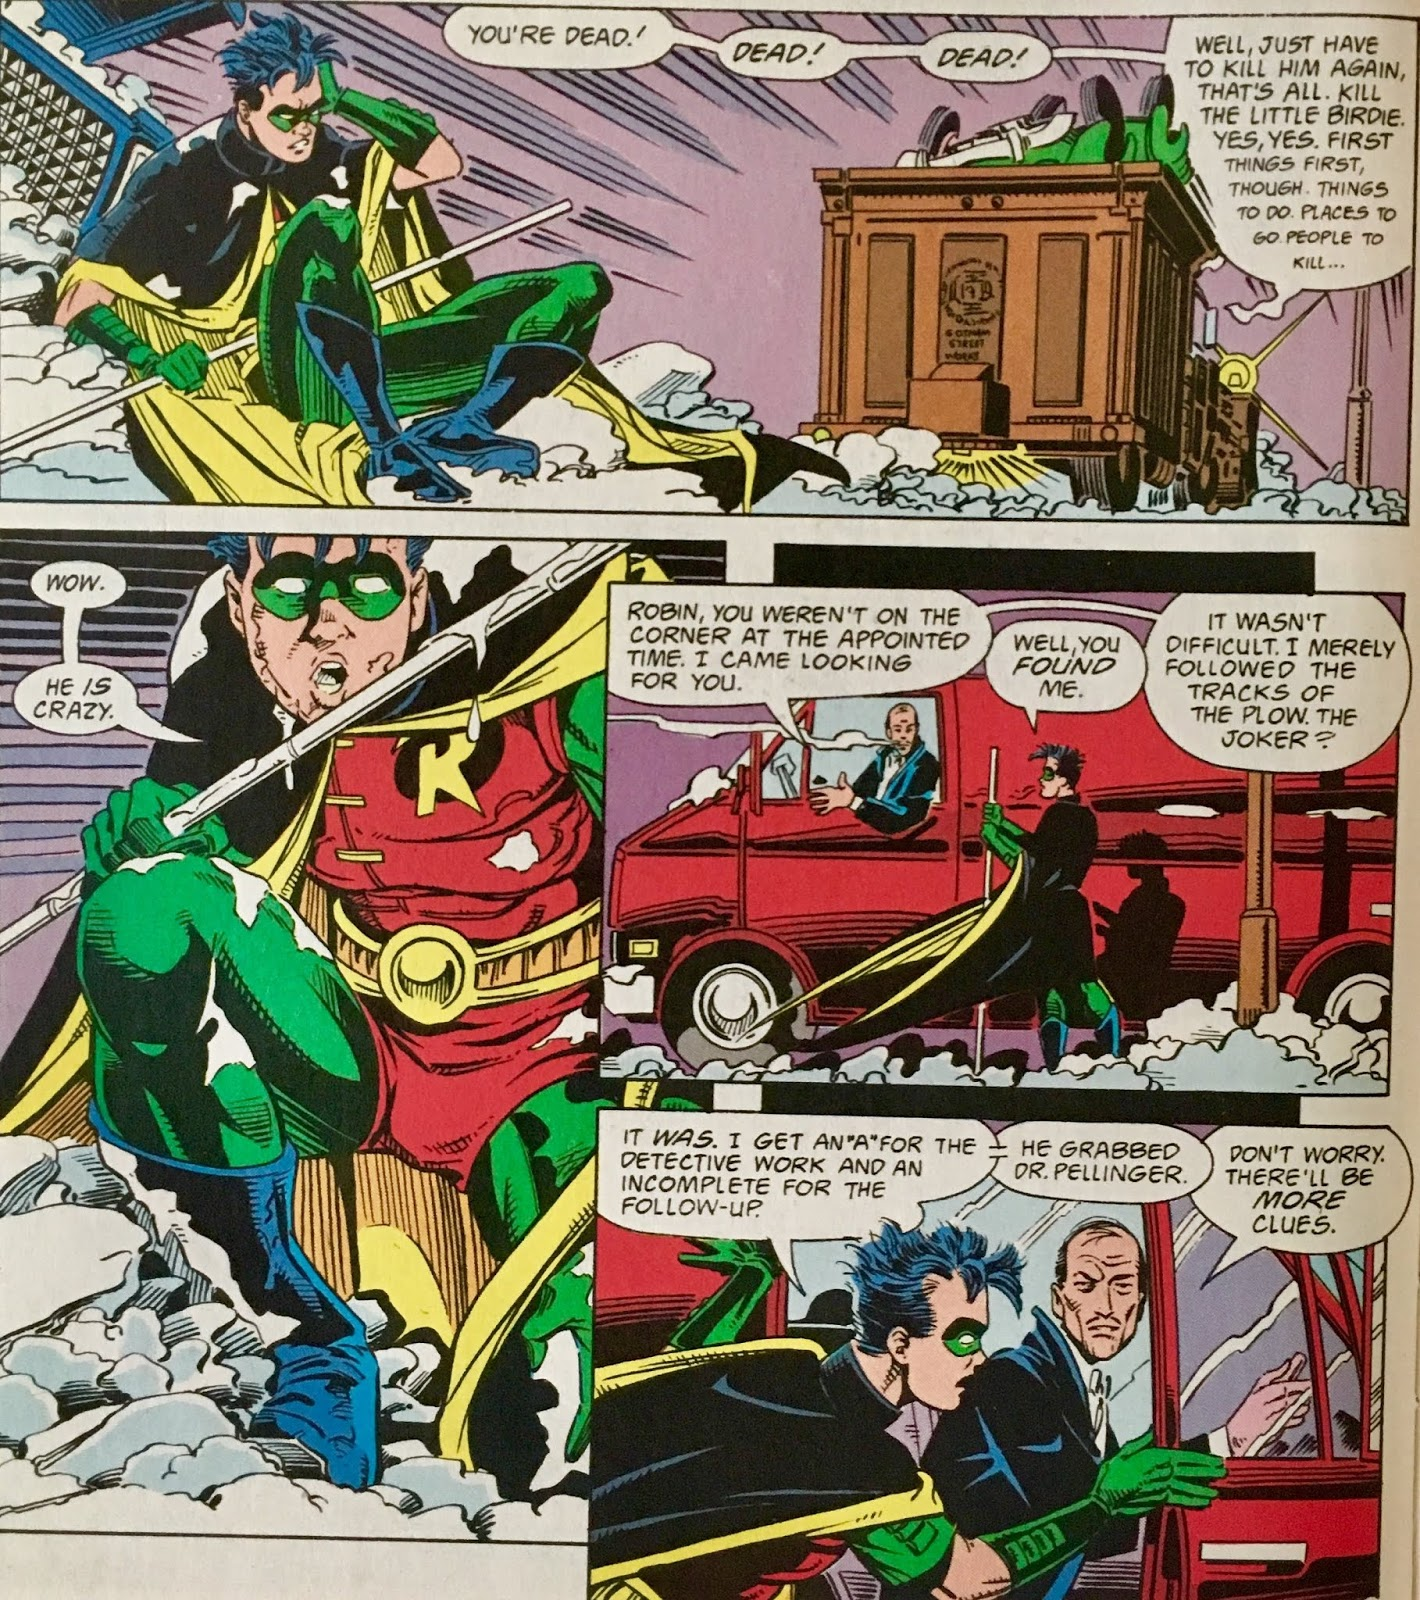 Chris is on Infinite Earths: Robin II: The Joker's Wild! #1